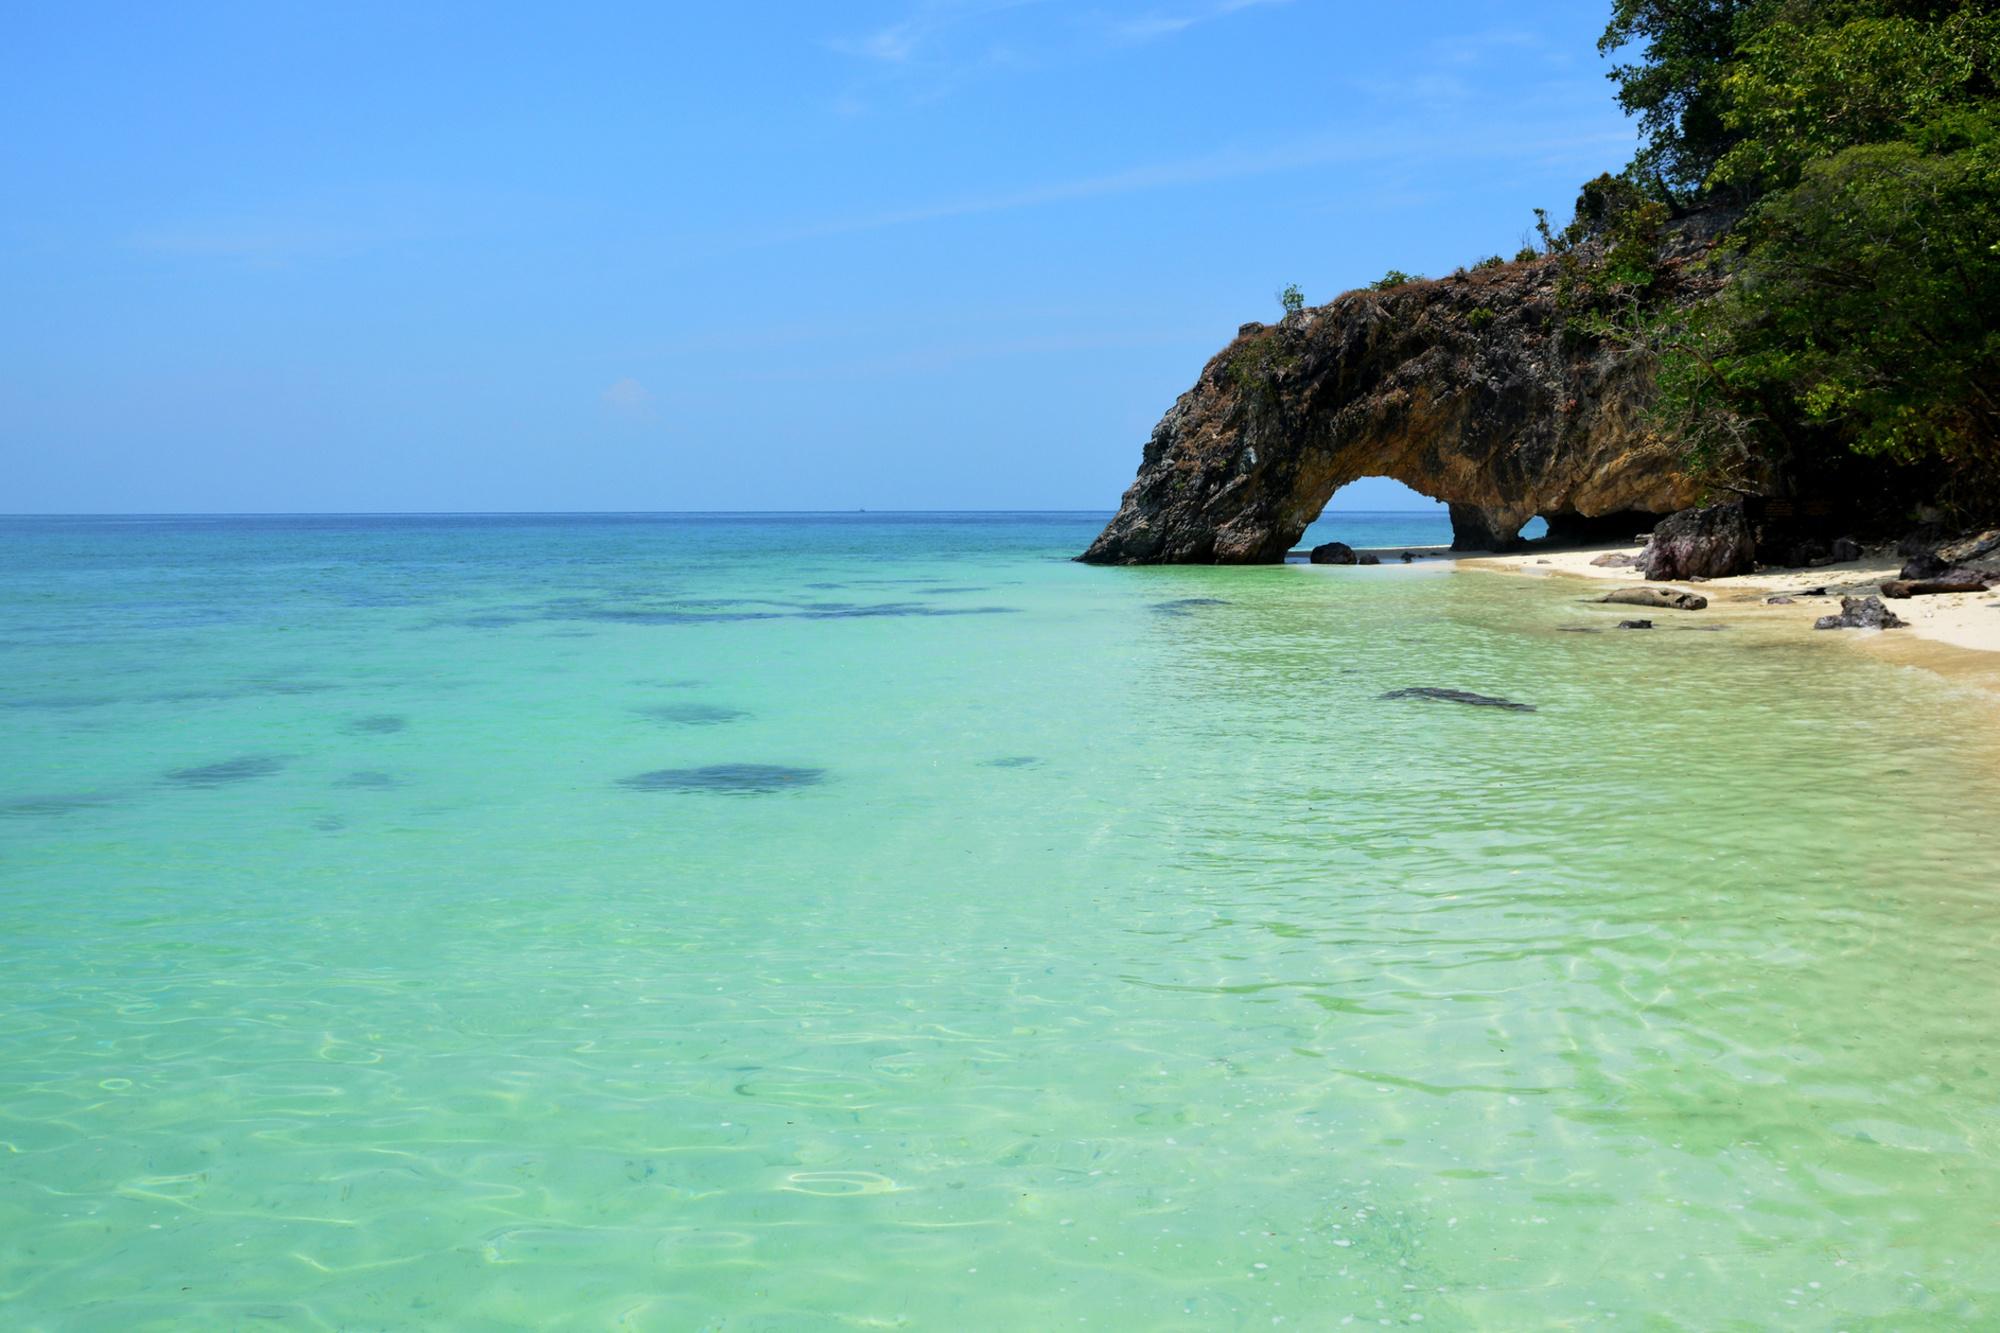 Tarutao National Marine Park, iStock